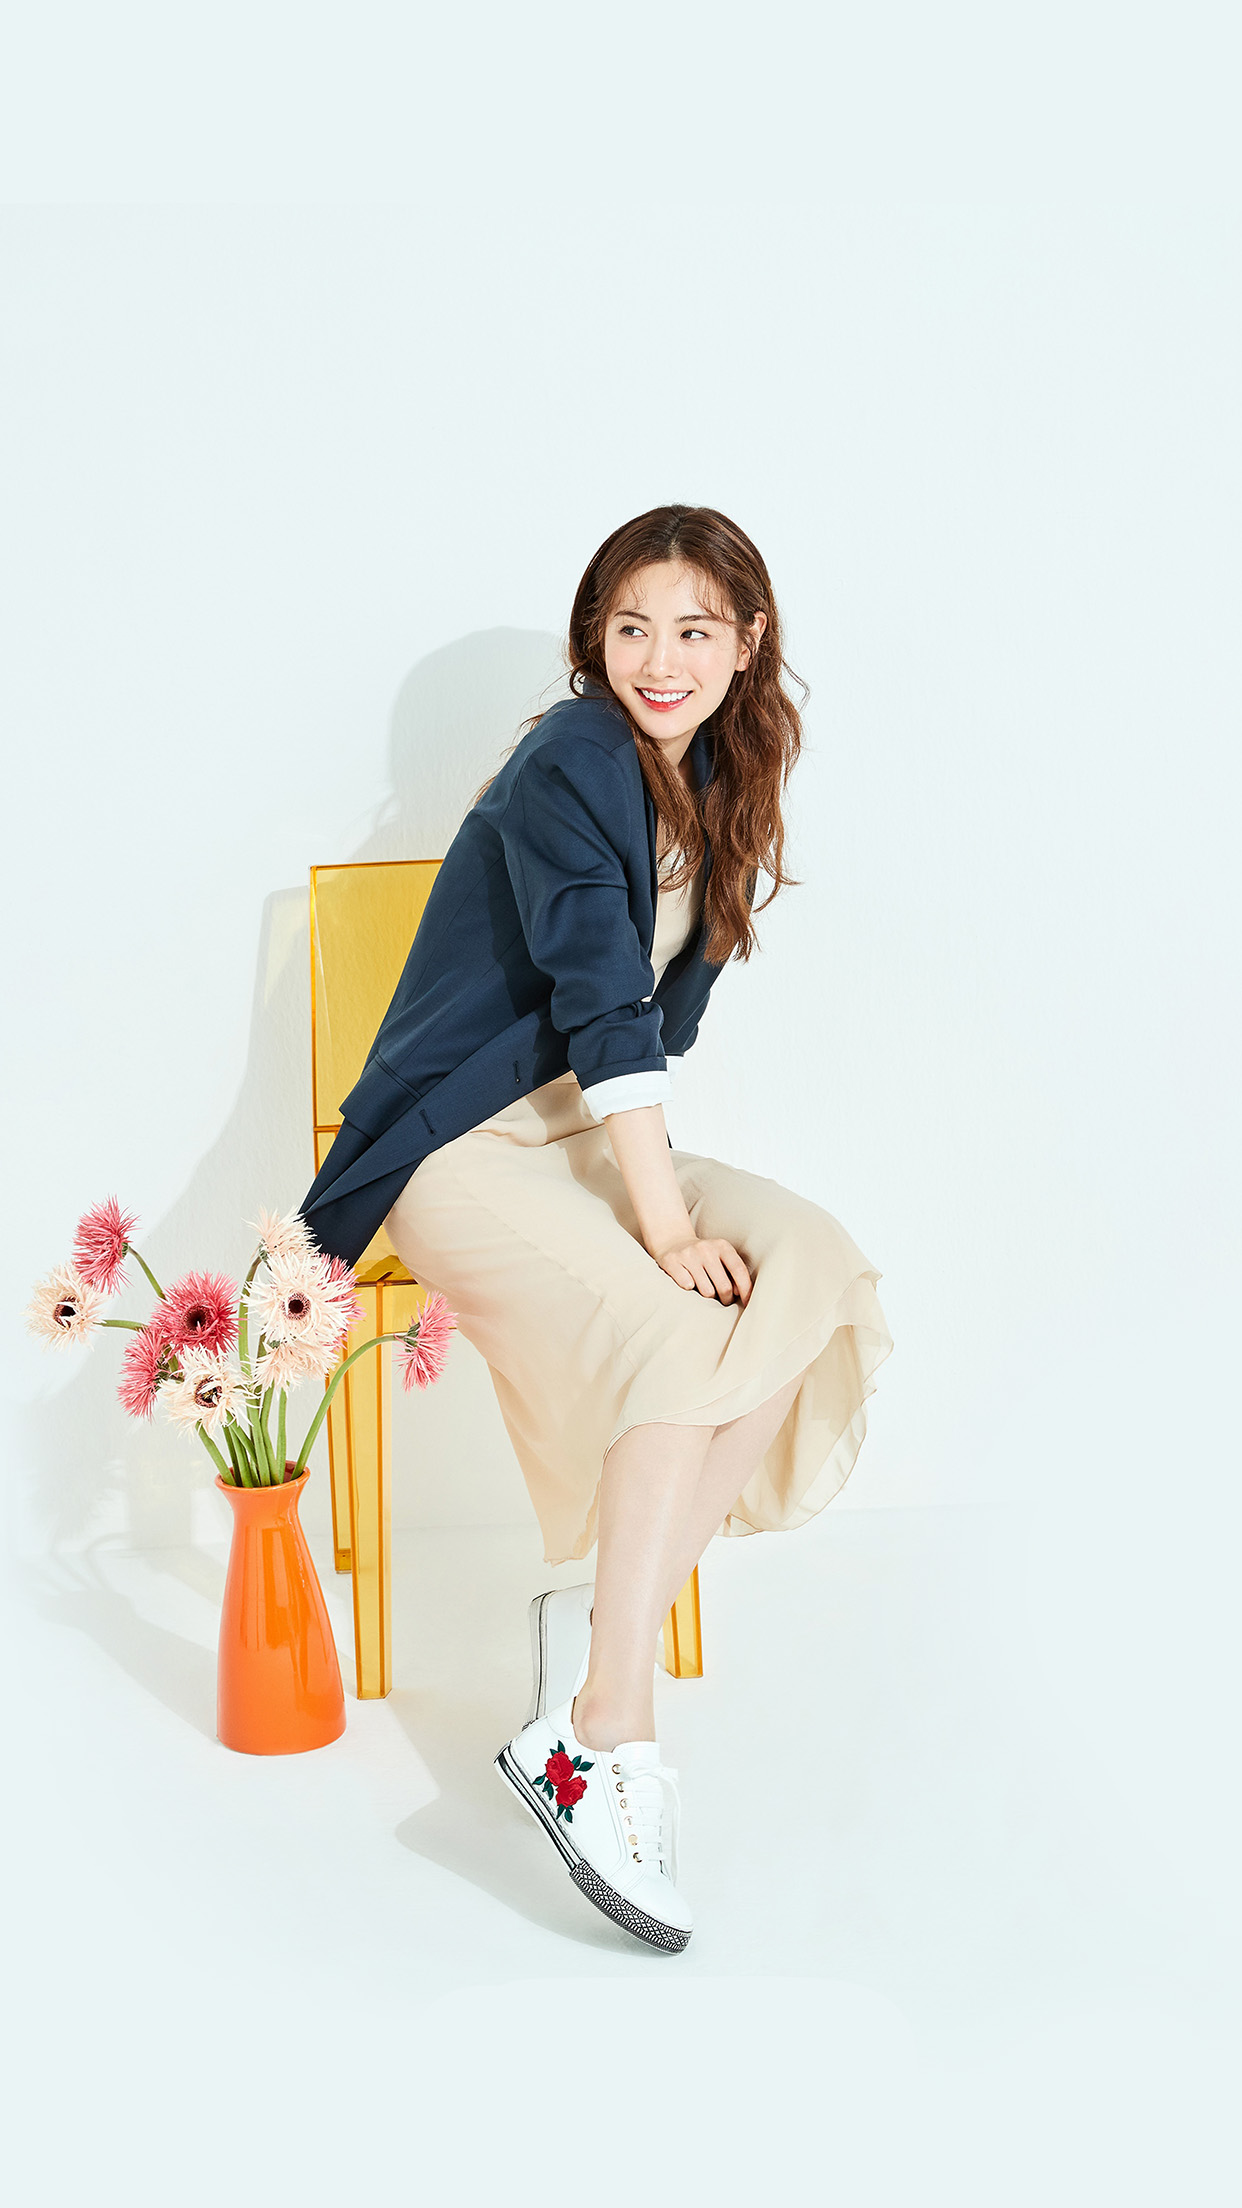 Iphone6papers Com Iphone 6 Wallpaper Hr72 Kpop Girl Korean Cute